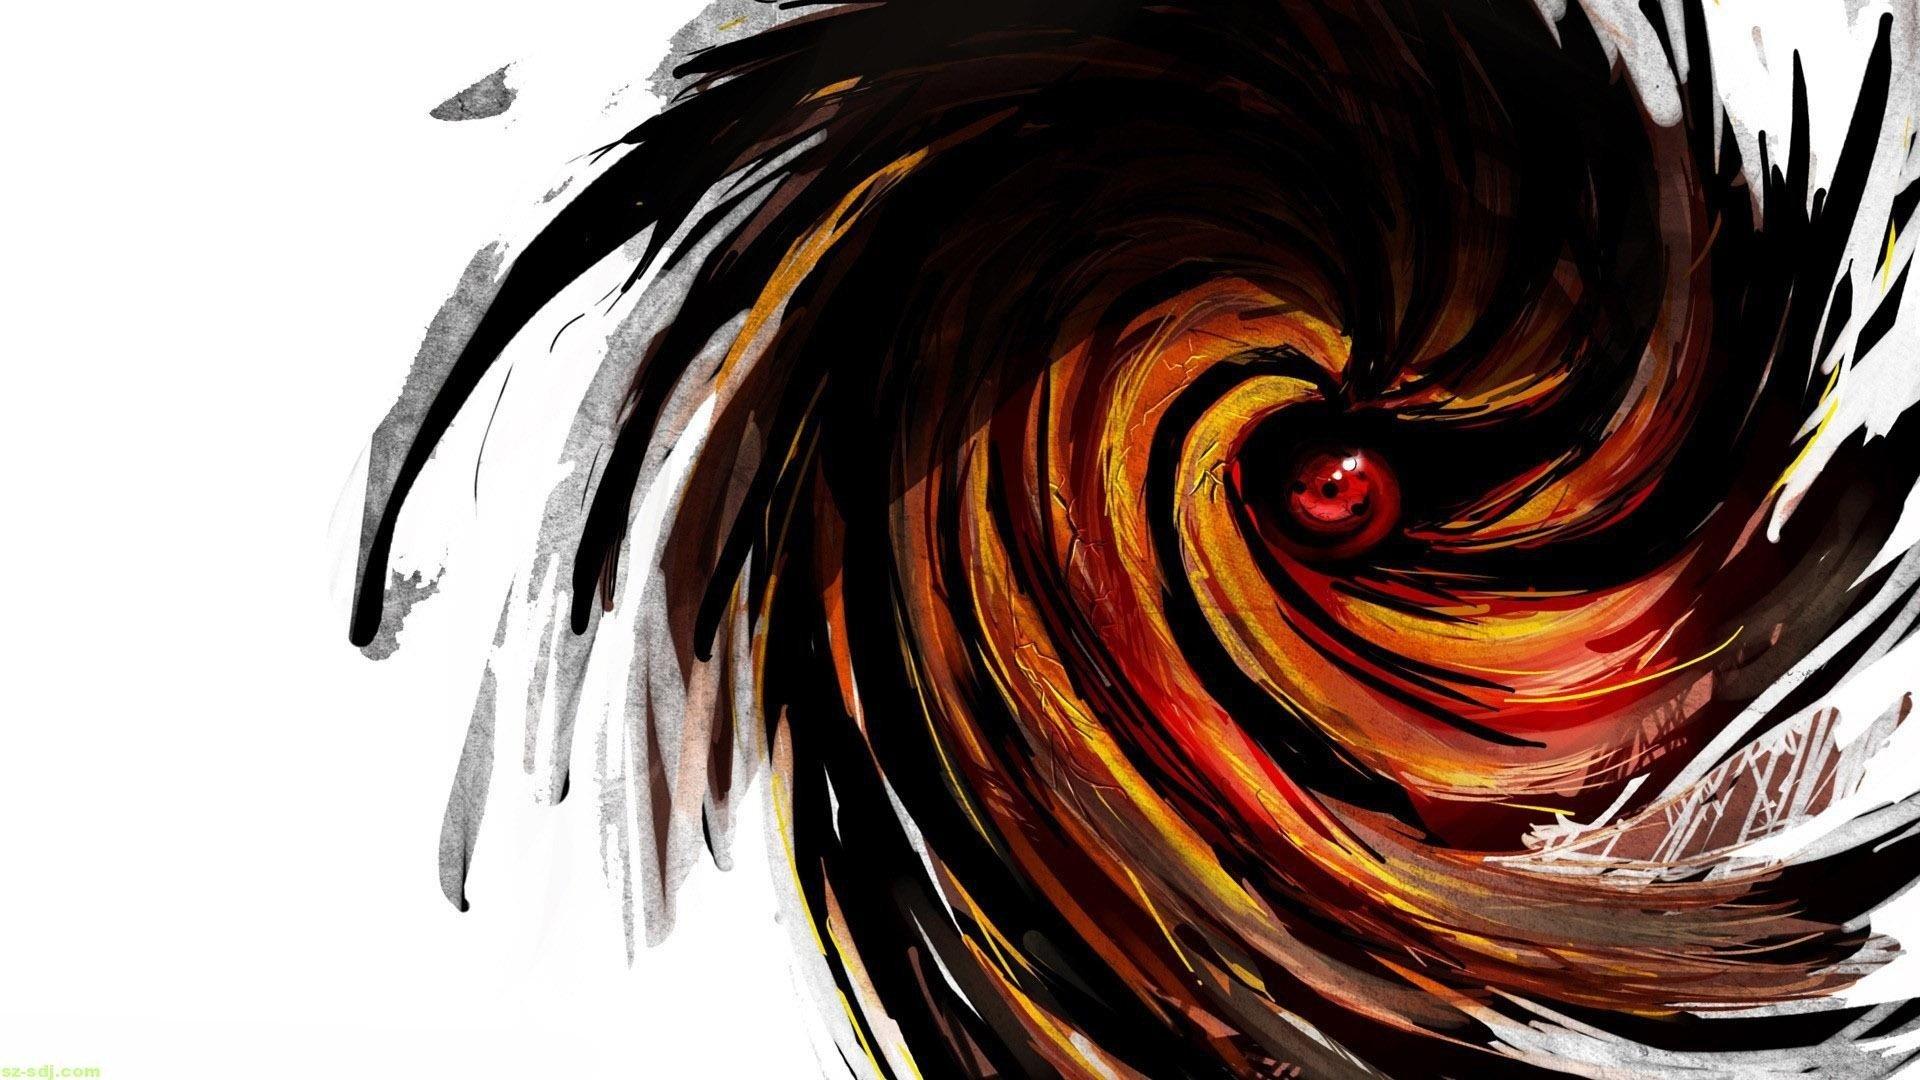 48 Sharingan (Naruto) HD Wallpapers | Backgrounds - Wallpaper Abyss